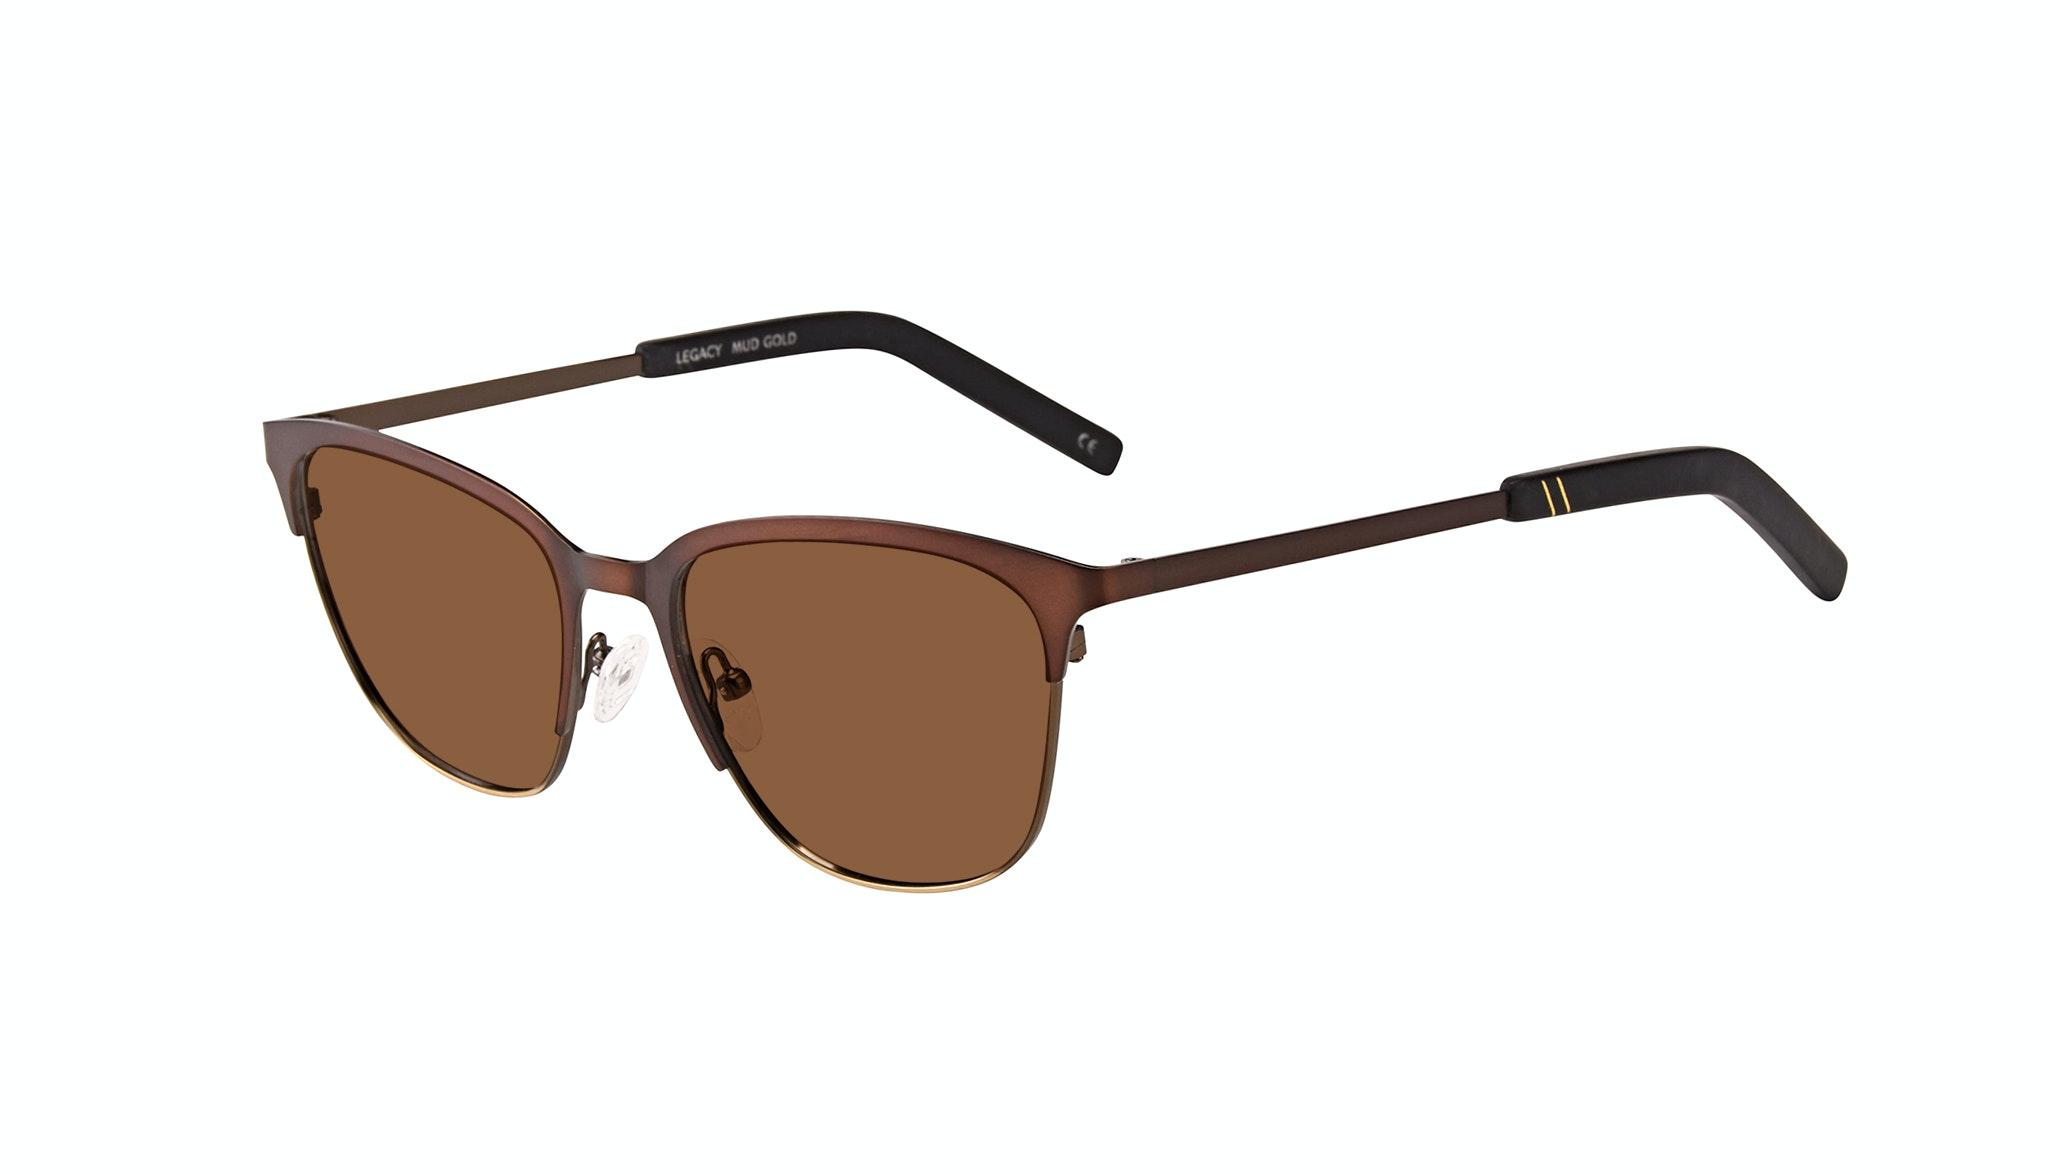 Affordable Fashion Glasses Rectangle Sunglasses Men Legacy Mud Gold Tilt